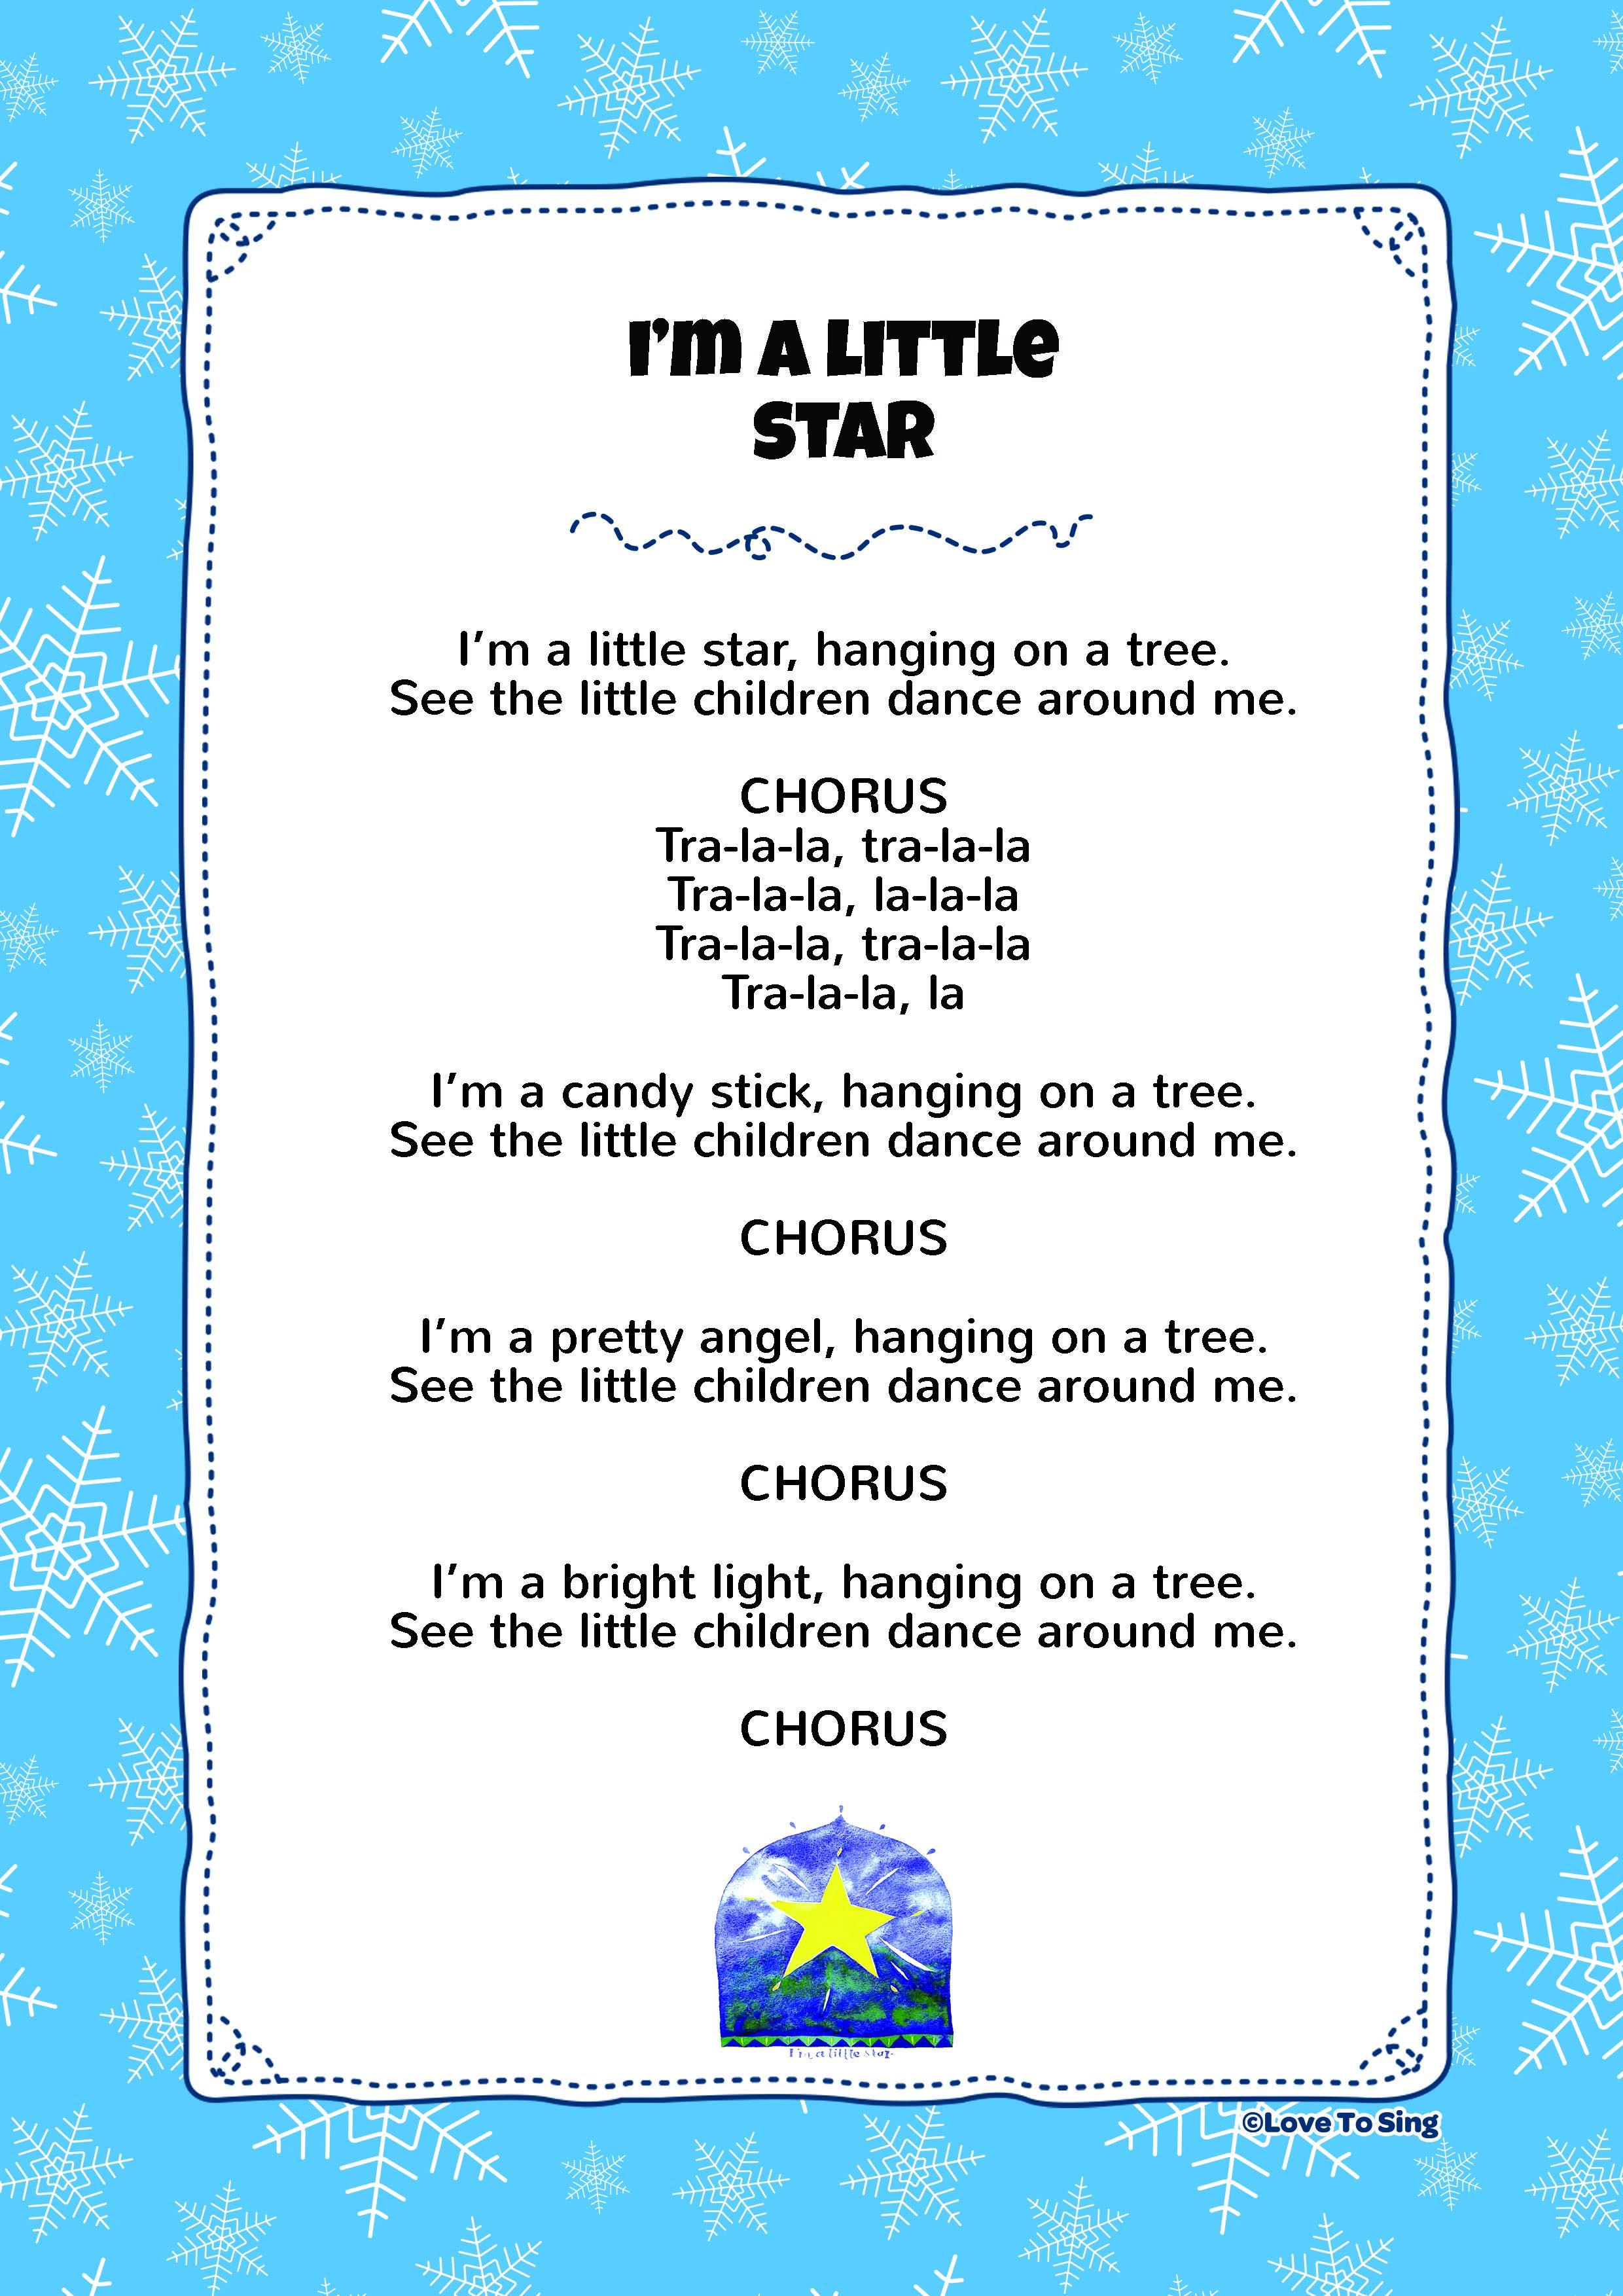 I'm A Little Star Kids video songs, Christmas songs